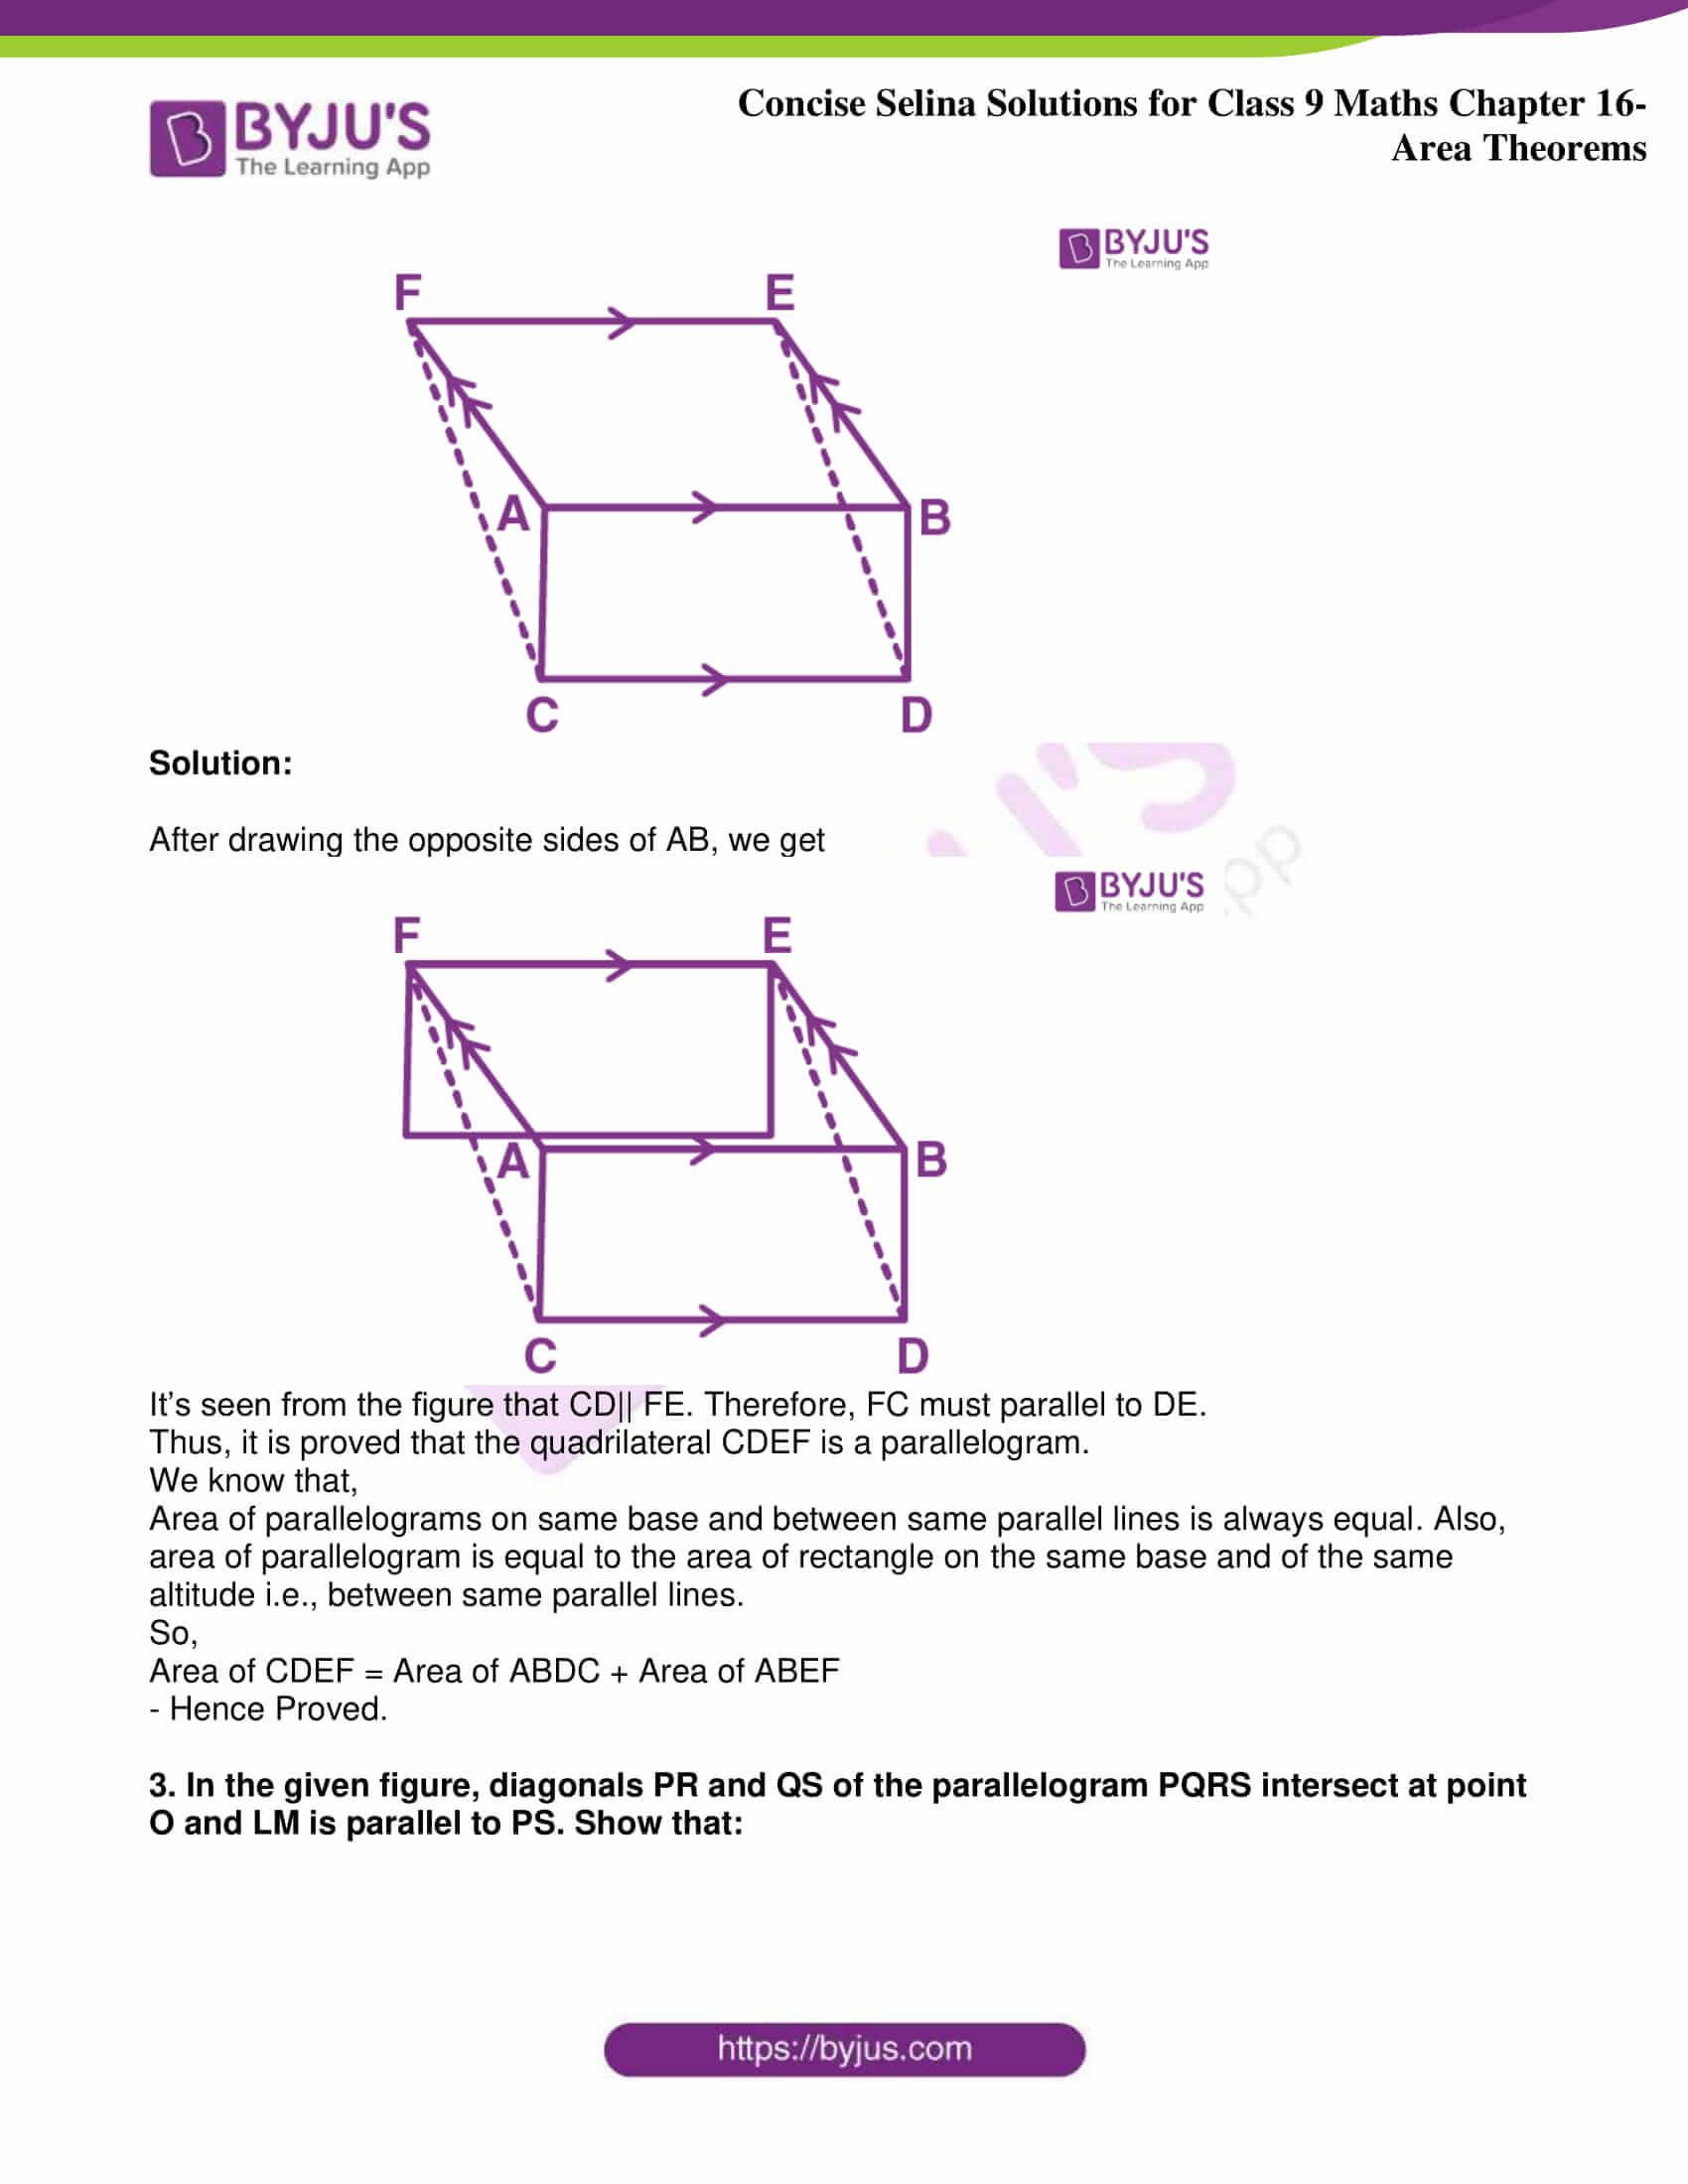 icse class 9 jun9 maths selina solutions chapter 16 area theorems 02